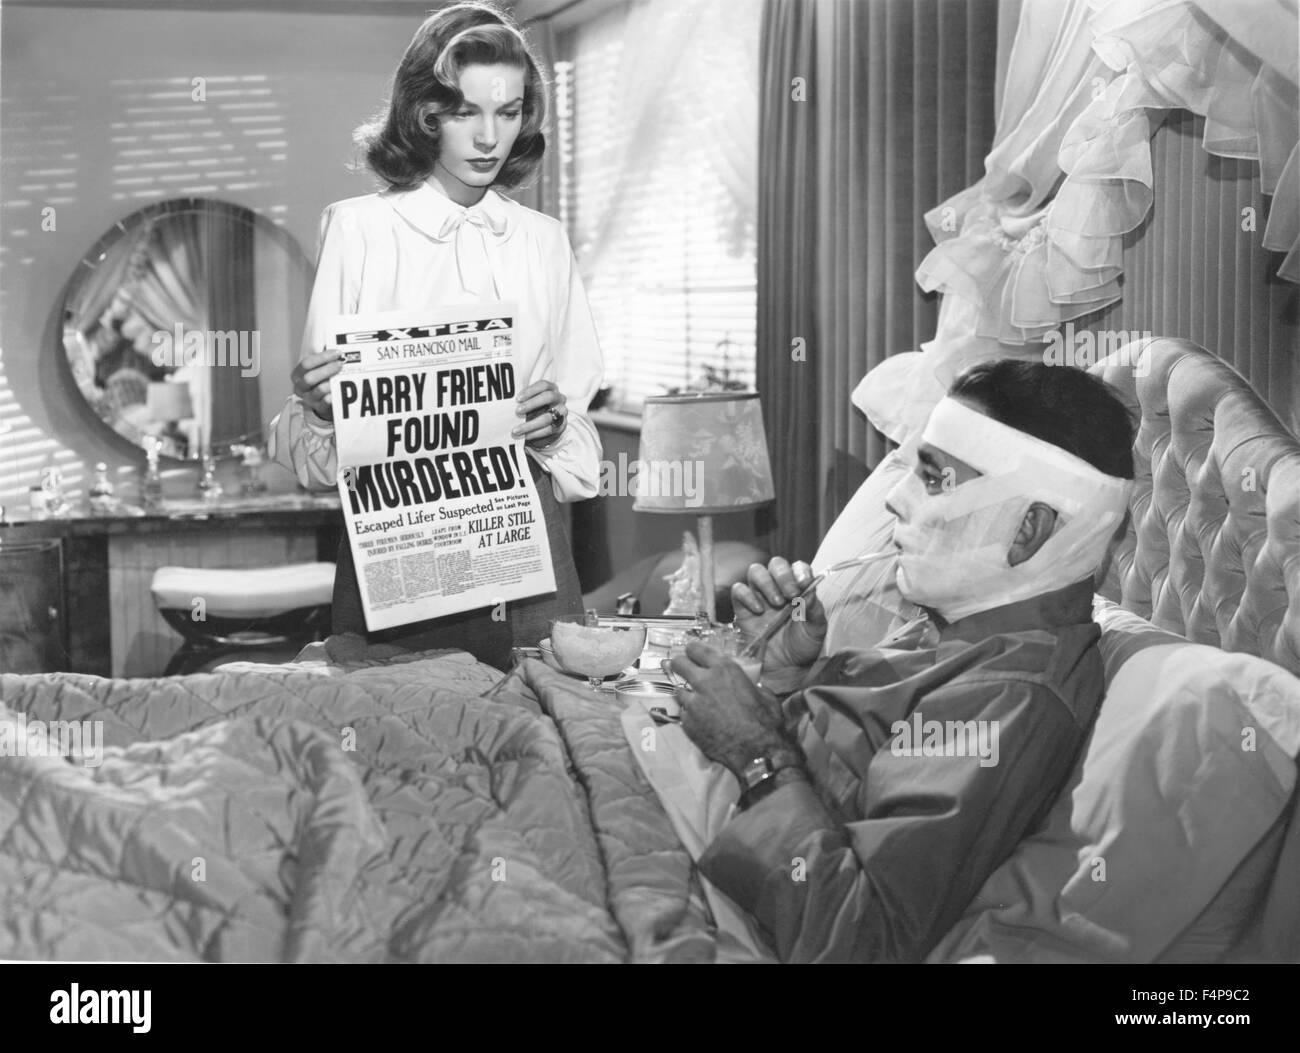 Humphrey Bogart, Lauren Bacall / Dark Passage / 1947 directed by Stock  Photo - Alamy